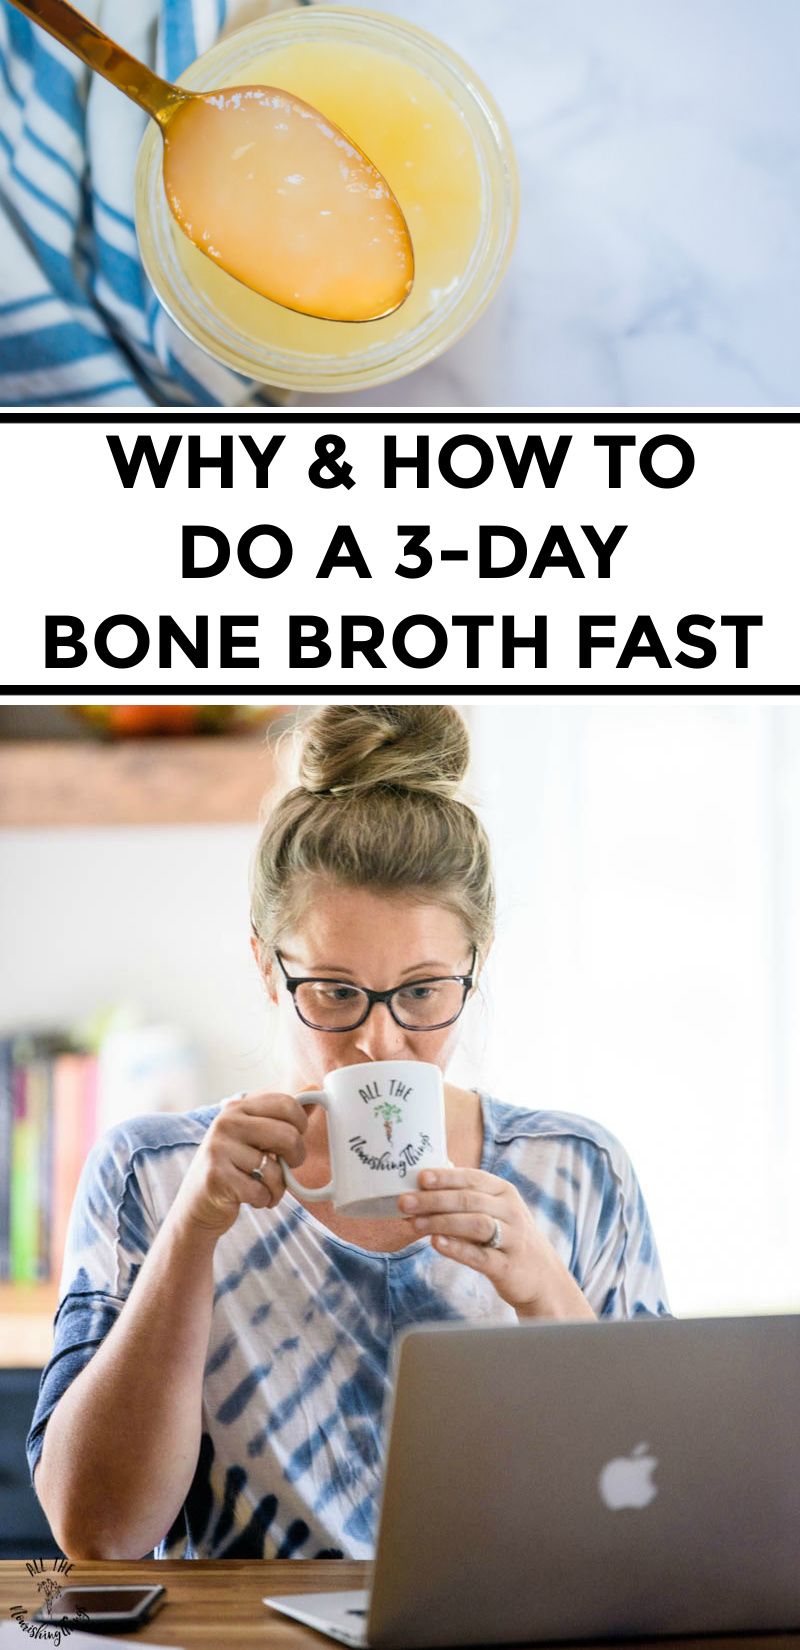 collage of images of bone broth and lindsey lockett drinking bone broth